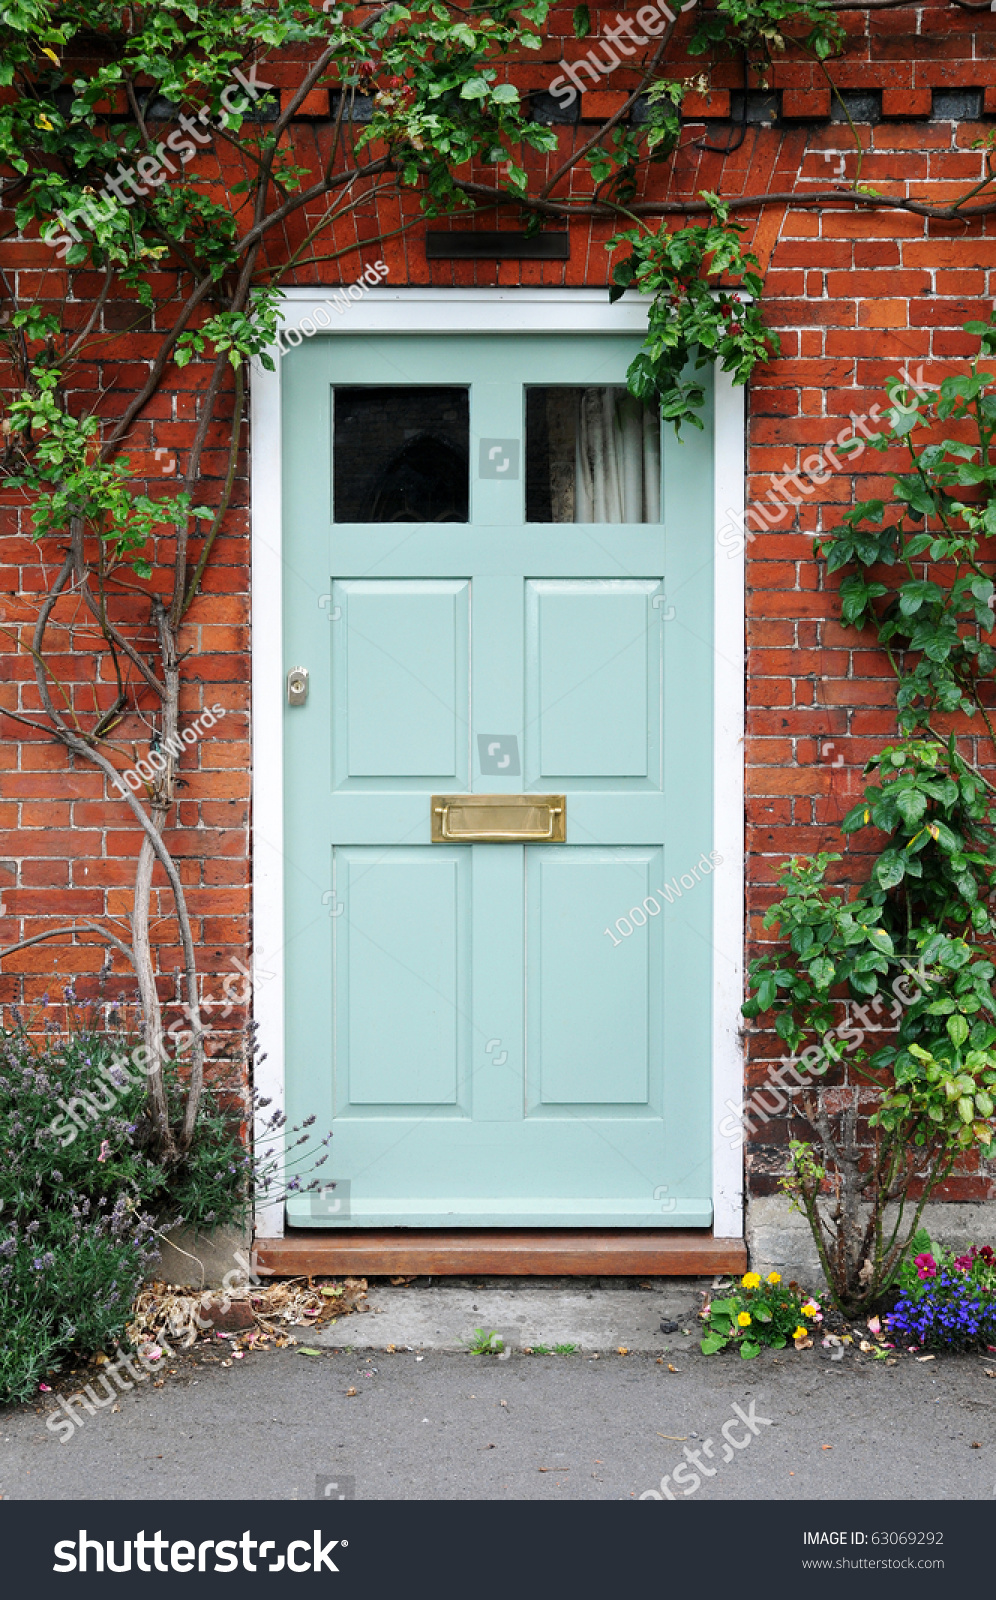 Red front door on brick house - Front Door Of A Beautiful Red Brick House